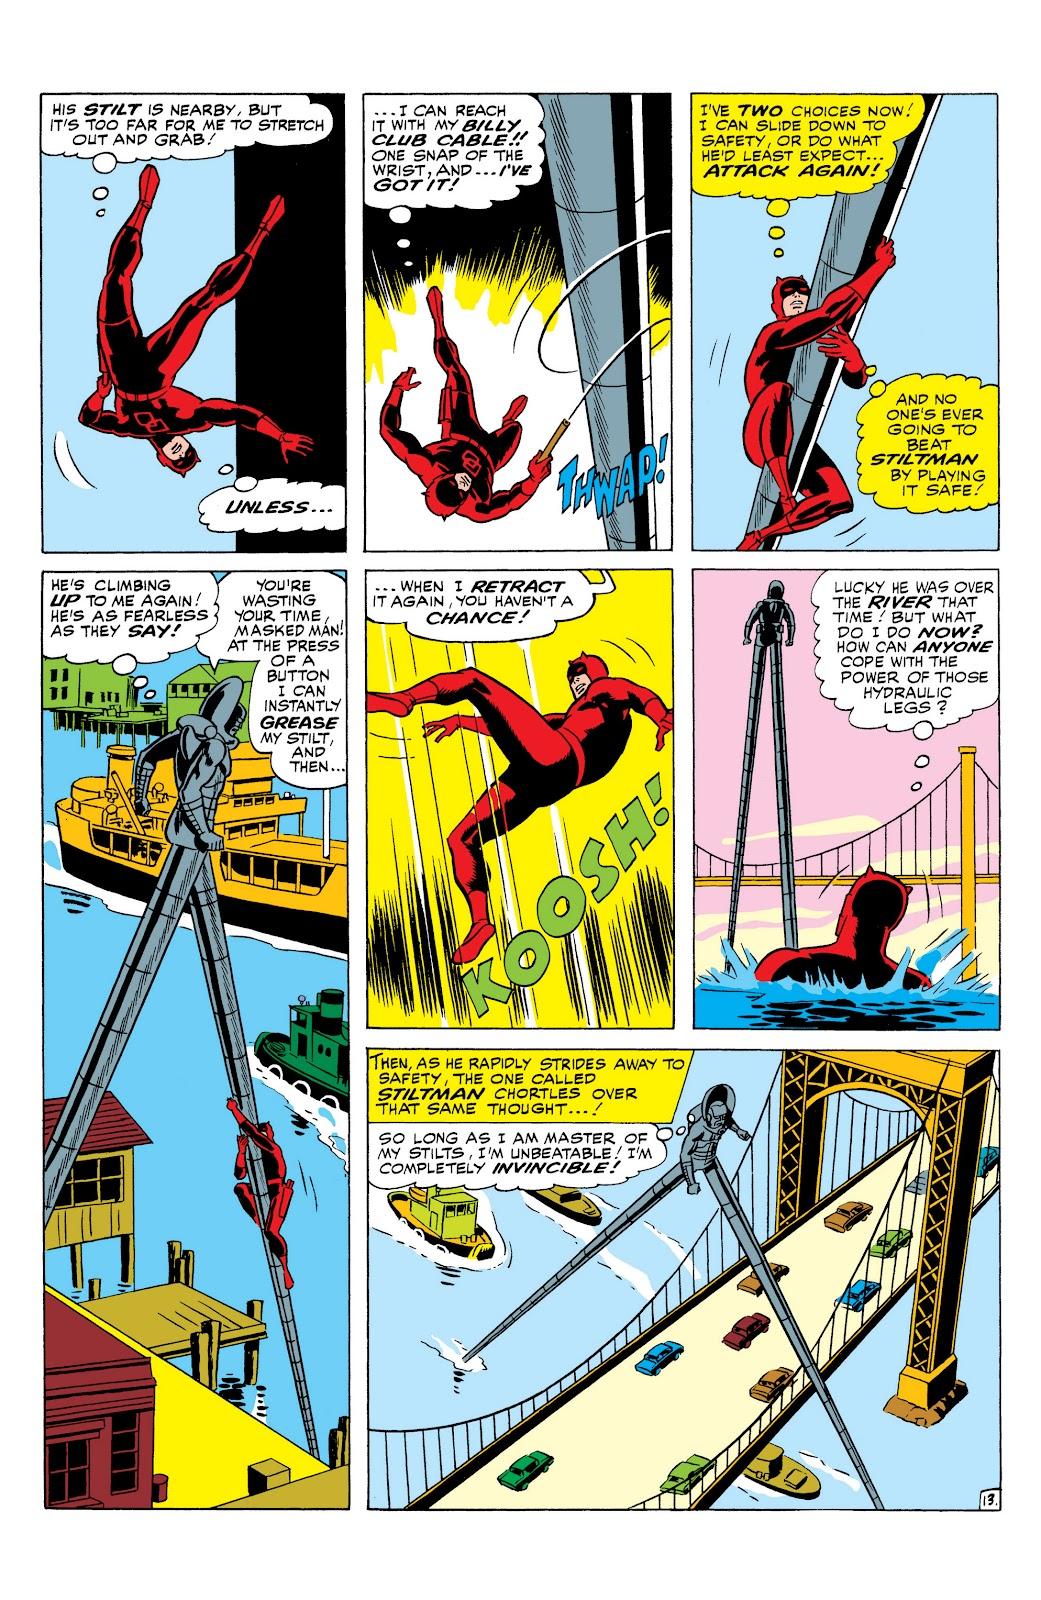 Read online Marvel Masterworks: Daredevil comic - Issue # TPB 1 (Part 2) - 77